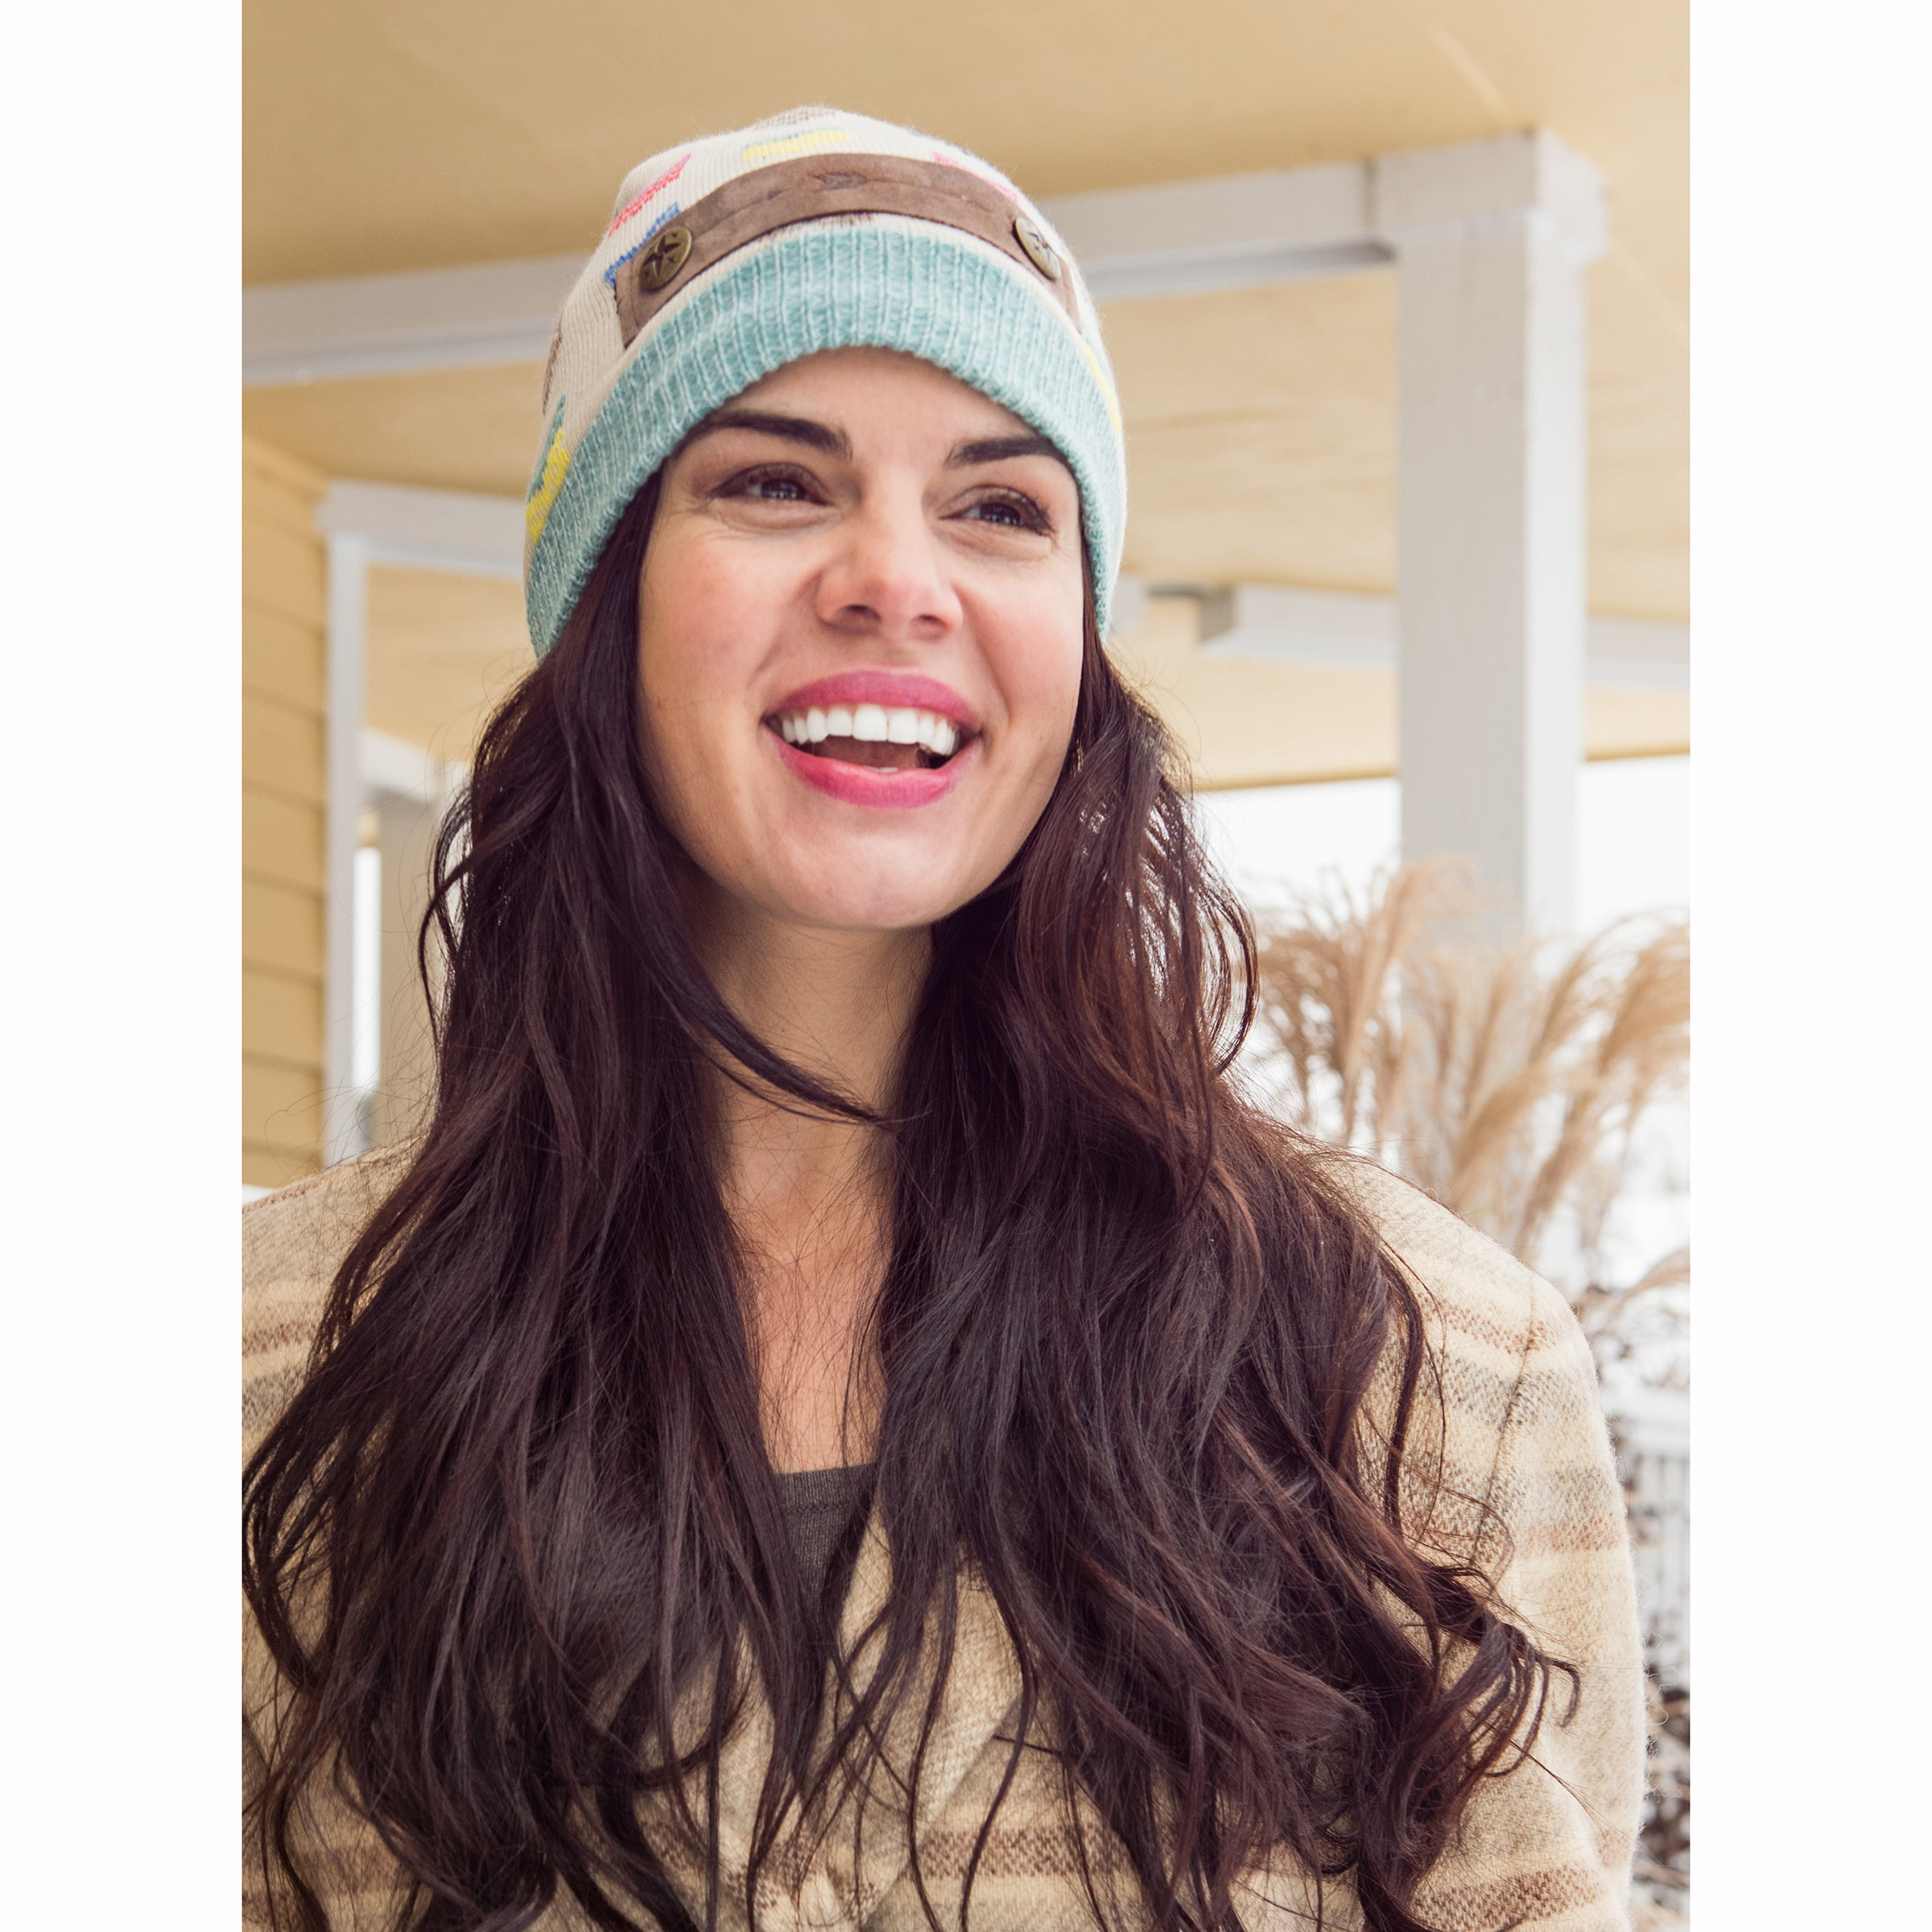 804d81b8253 Shop MUK LUKS® Women s Multi Beanie - Free Shipping On Orders Over  45 -  Overstock.com - 17031284